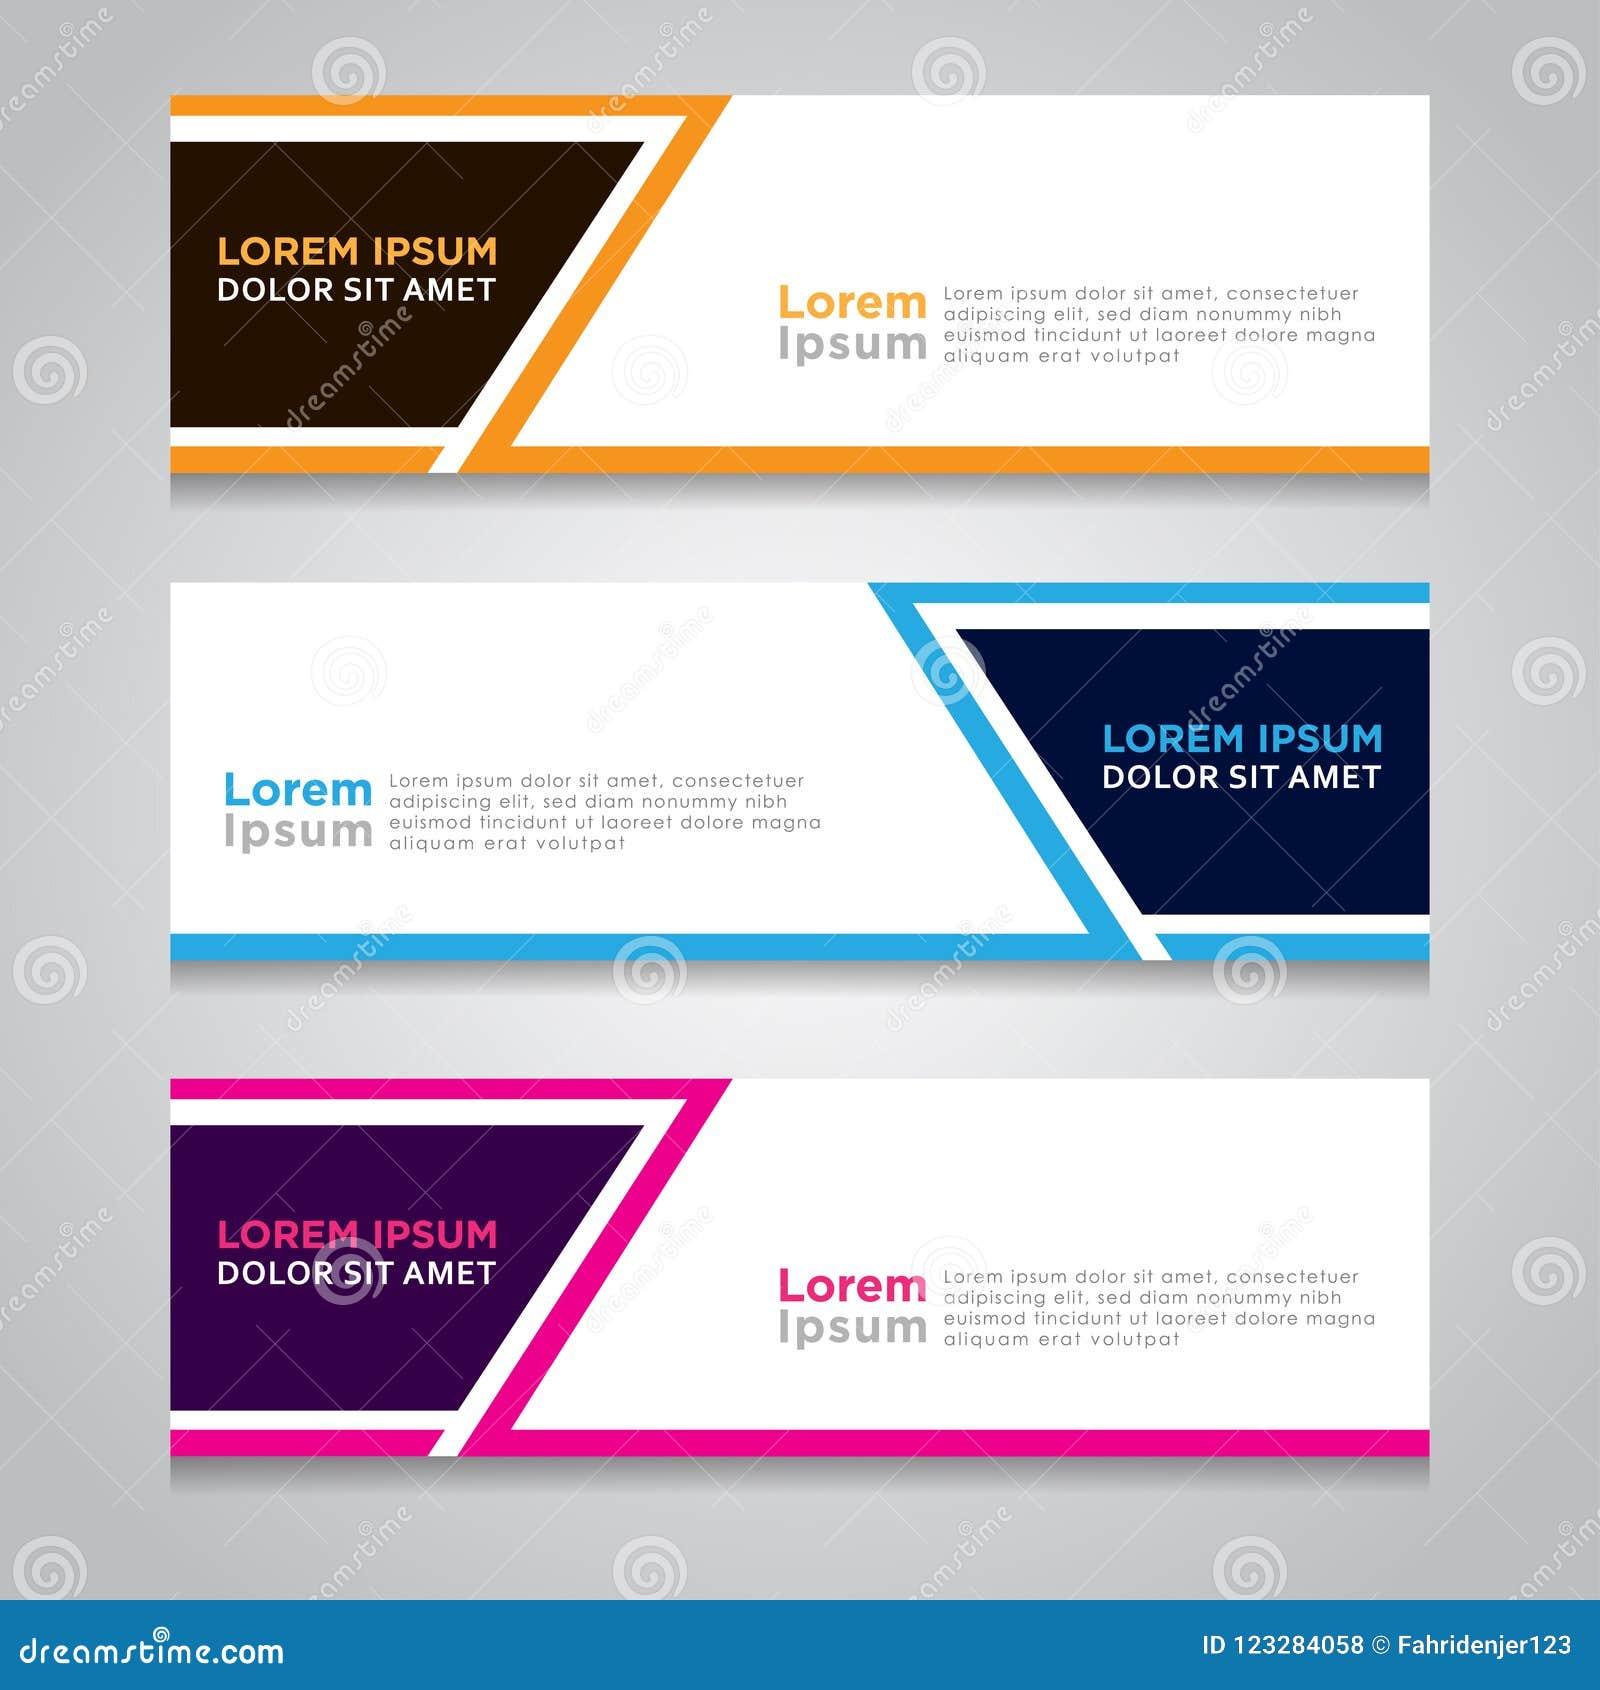 Contoh Spanduk: Vector Abstract Design Banner Template. Stock Vector